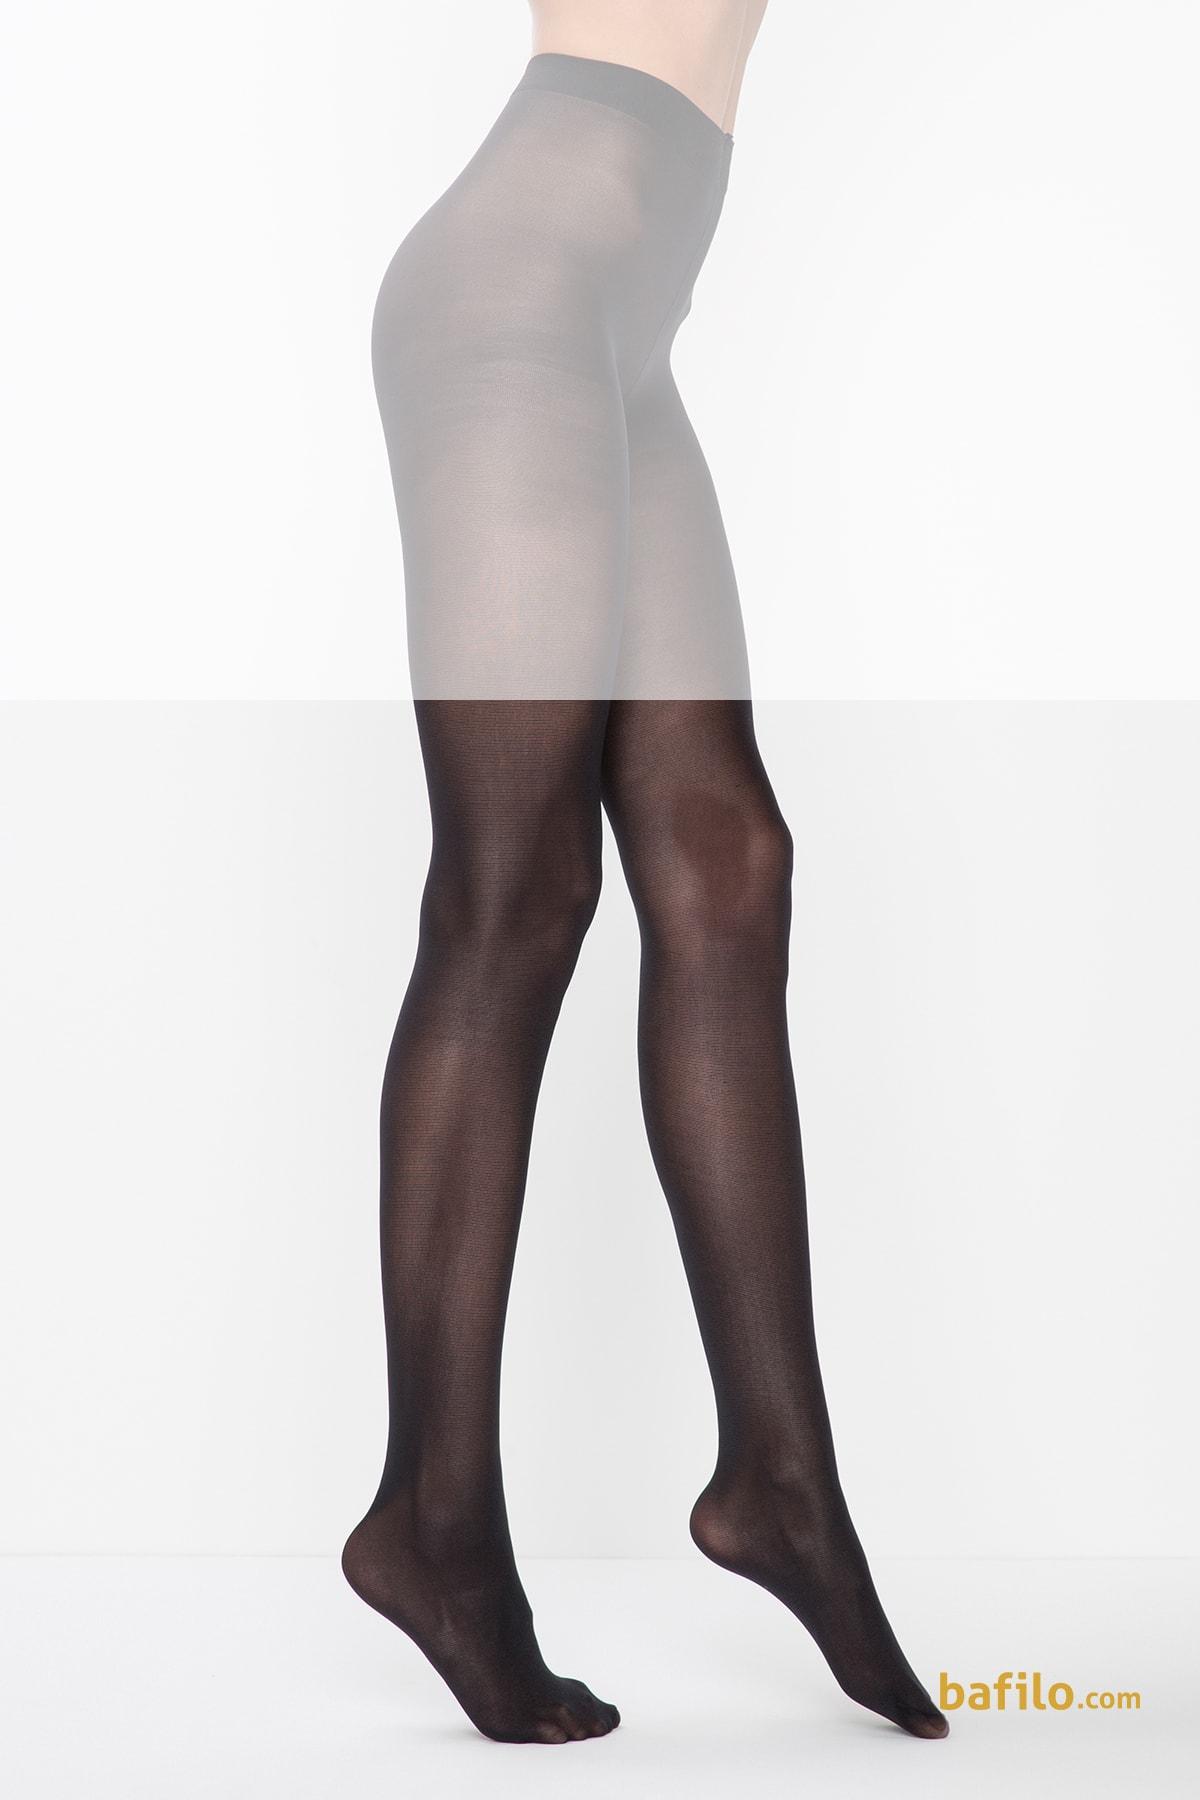 جوراب شلواری زنانه پنتی Mikro 40 مشکی - Thumbnail